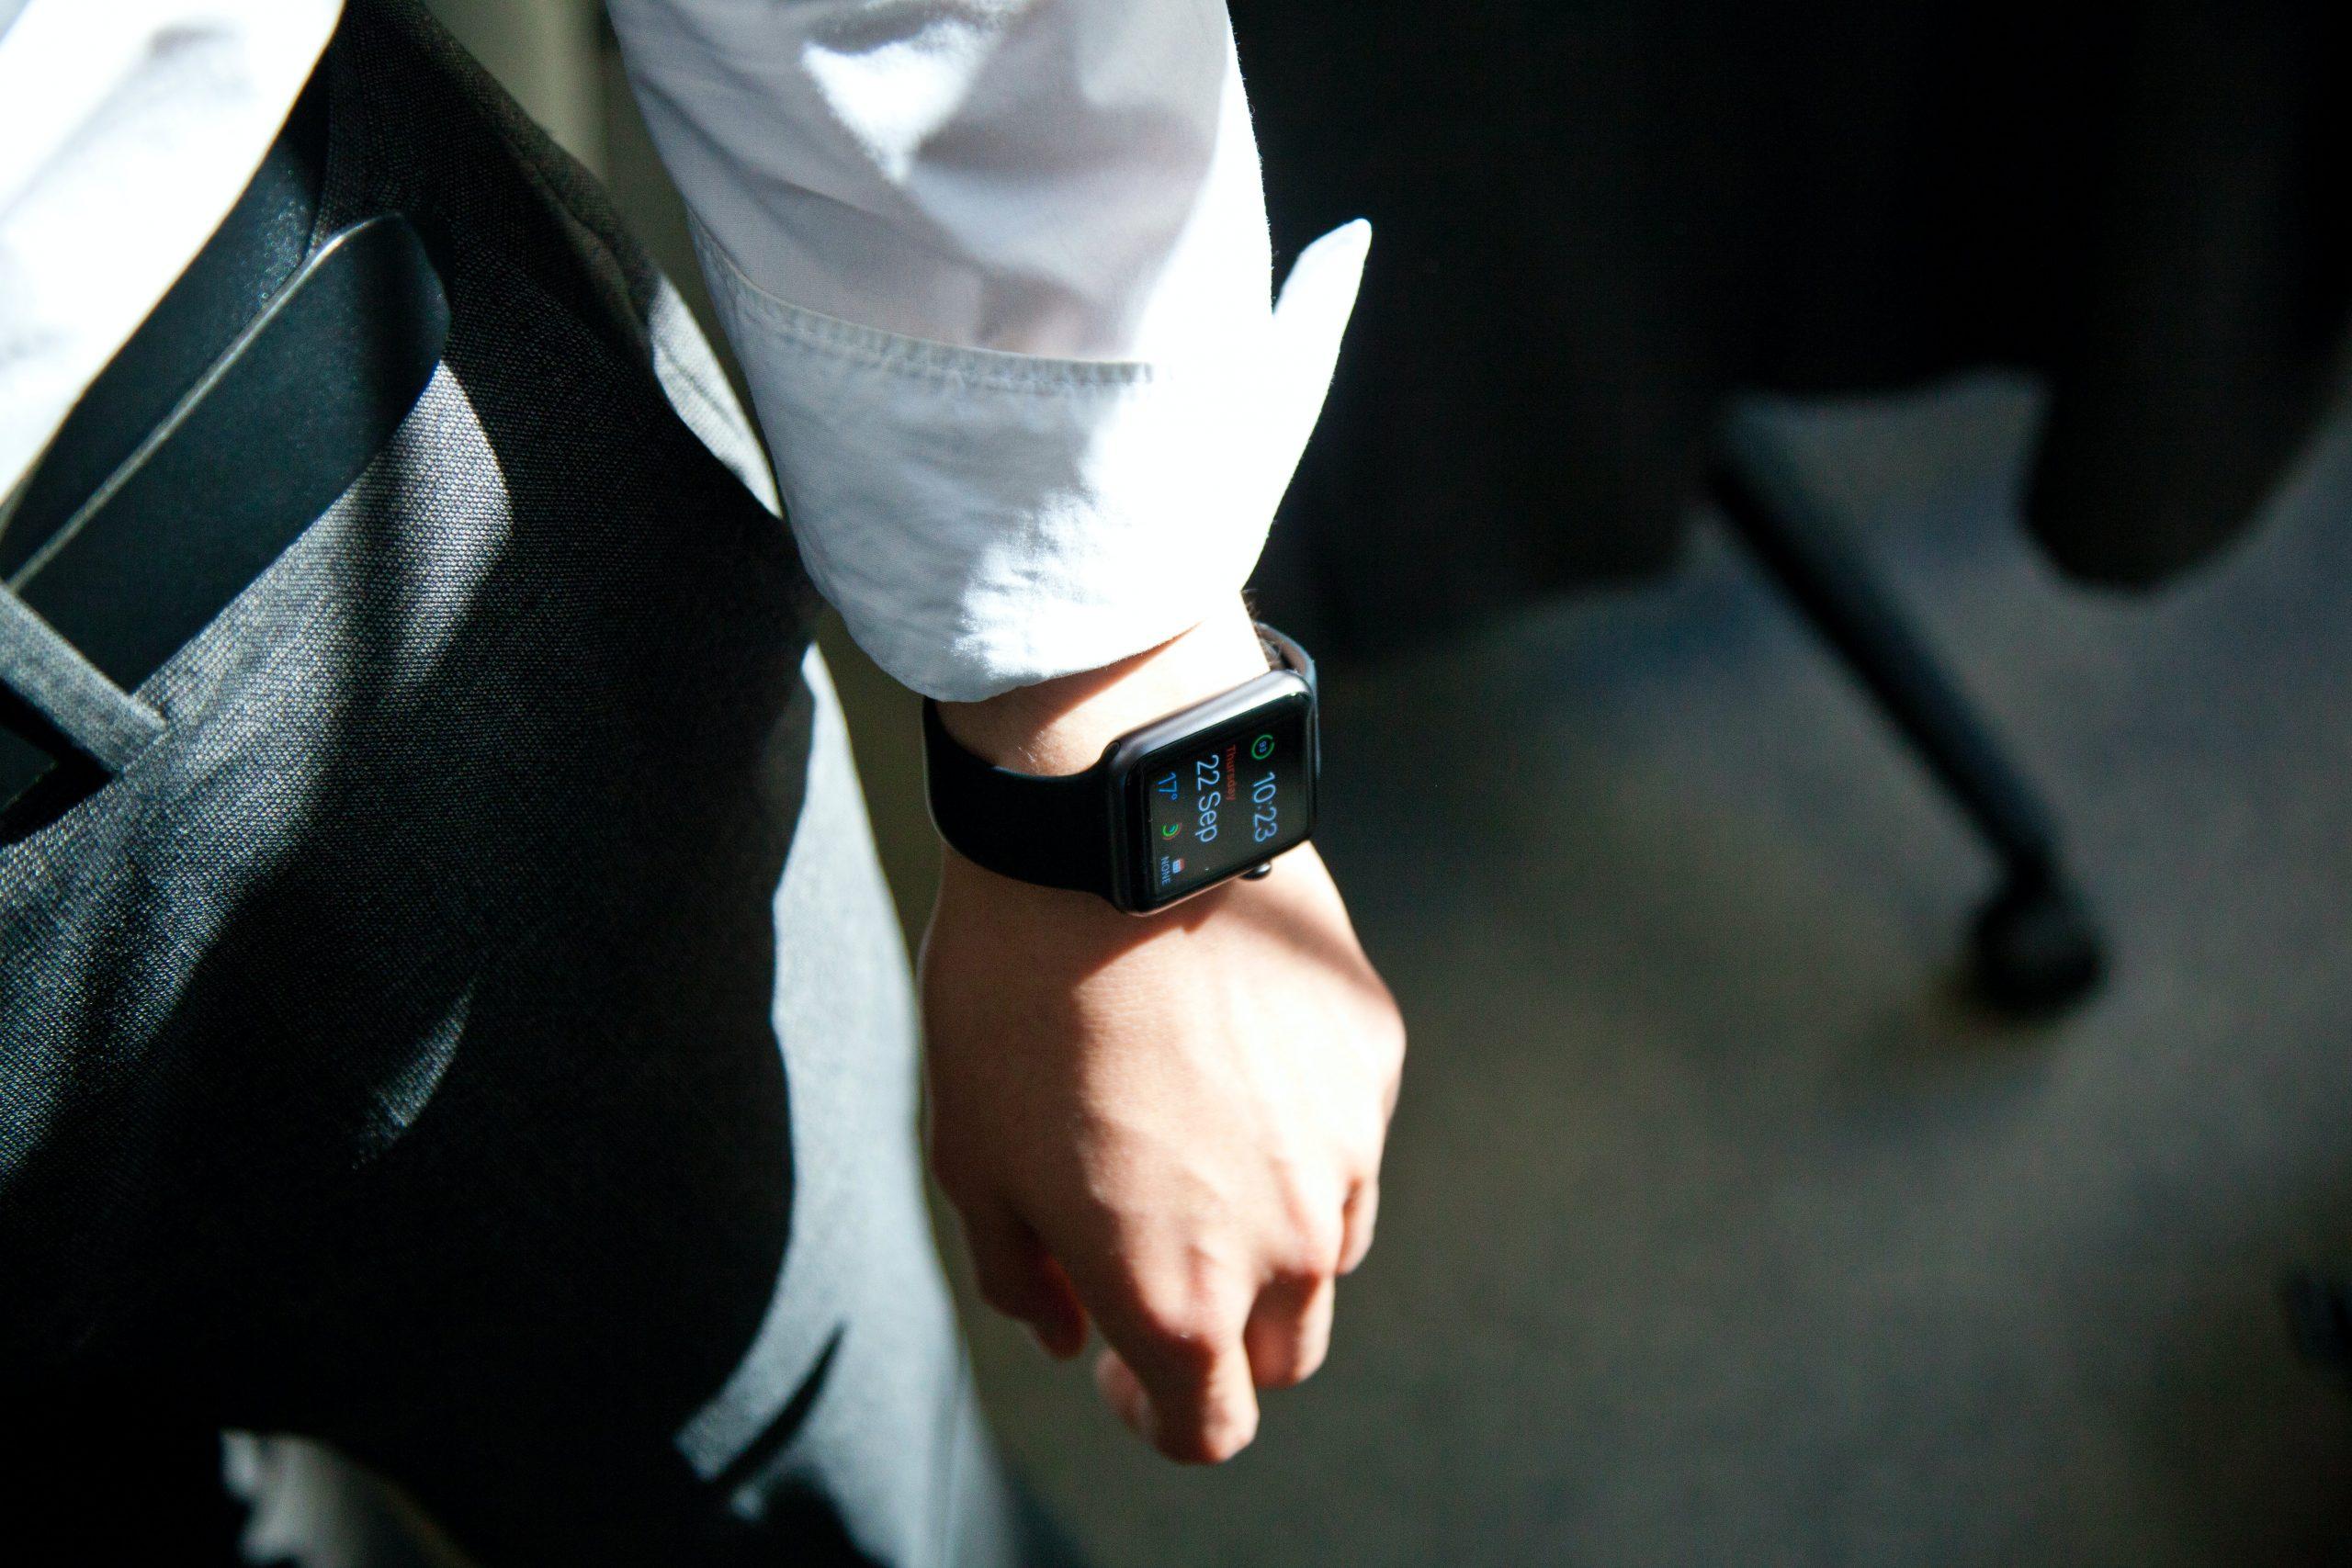 Imagende un brazo usando smartwatch